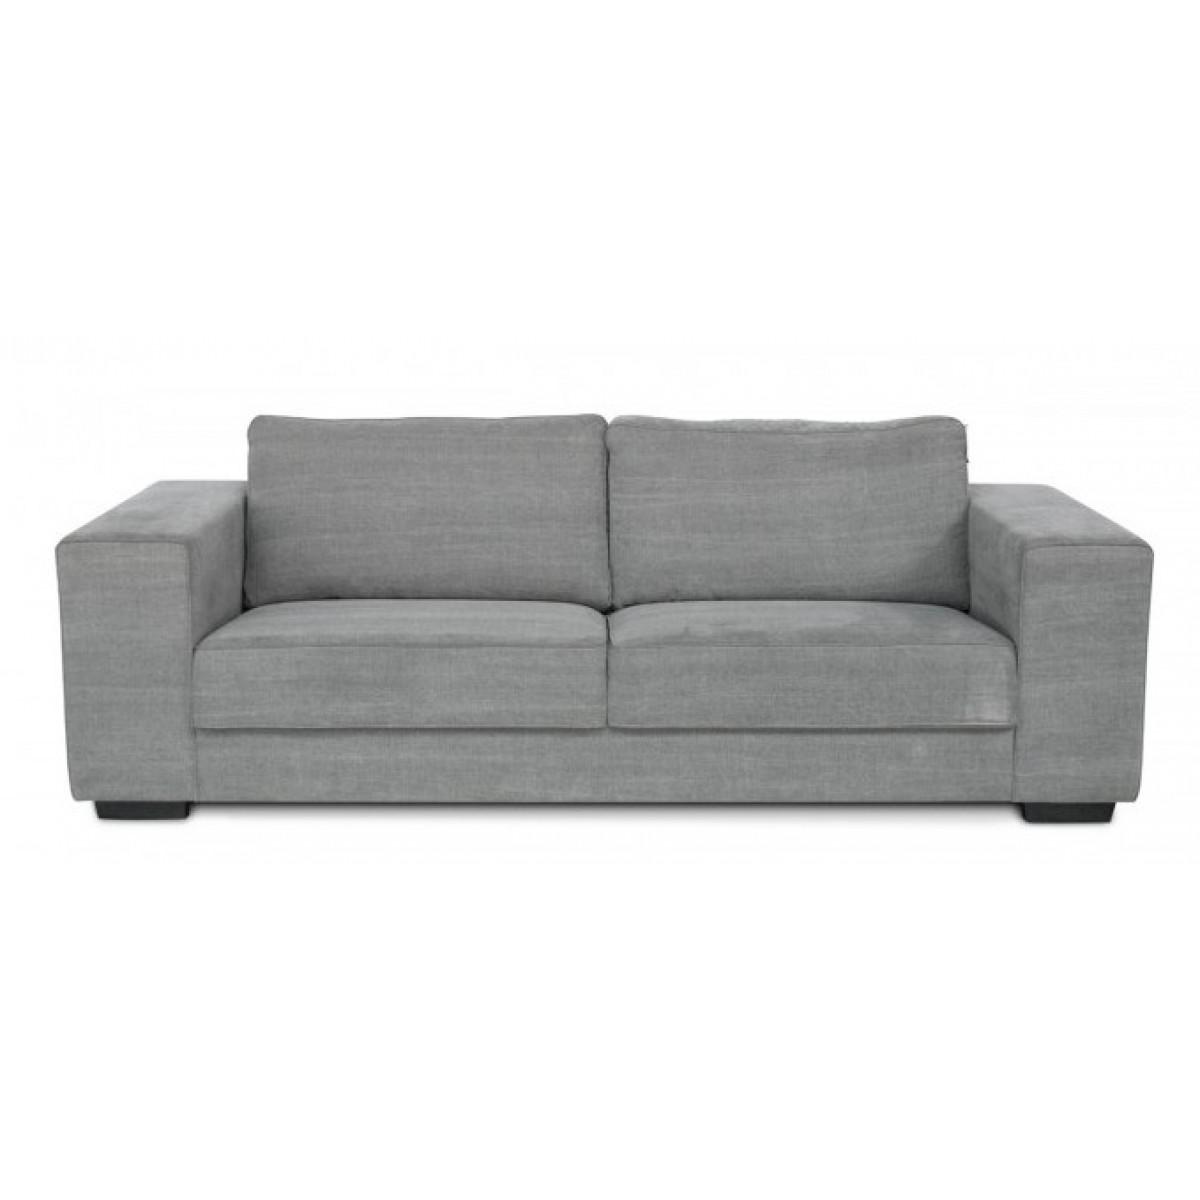 Sofa icon sofas stoff i live design preisg nstig online moebel kaufen - Designer ecksofas stoff ...